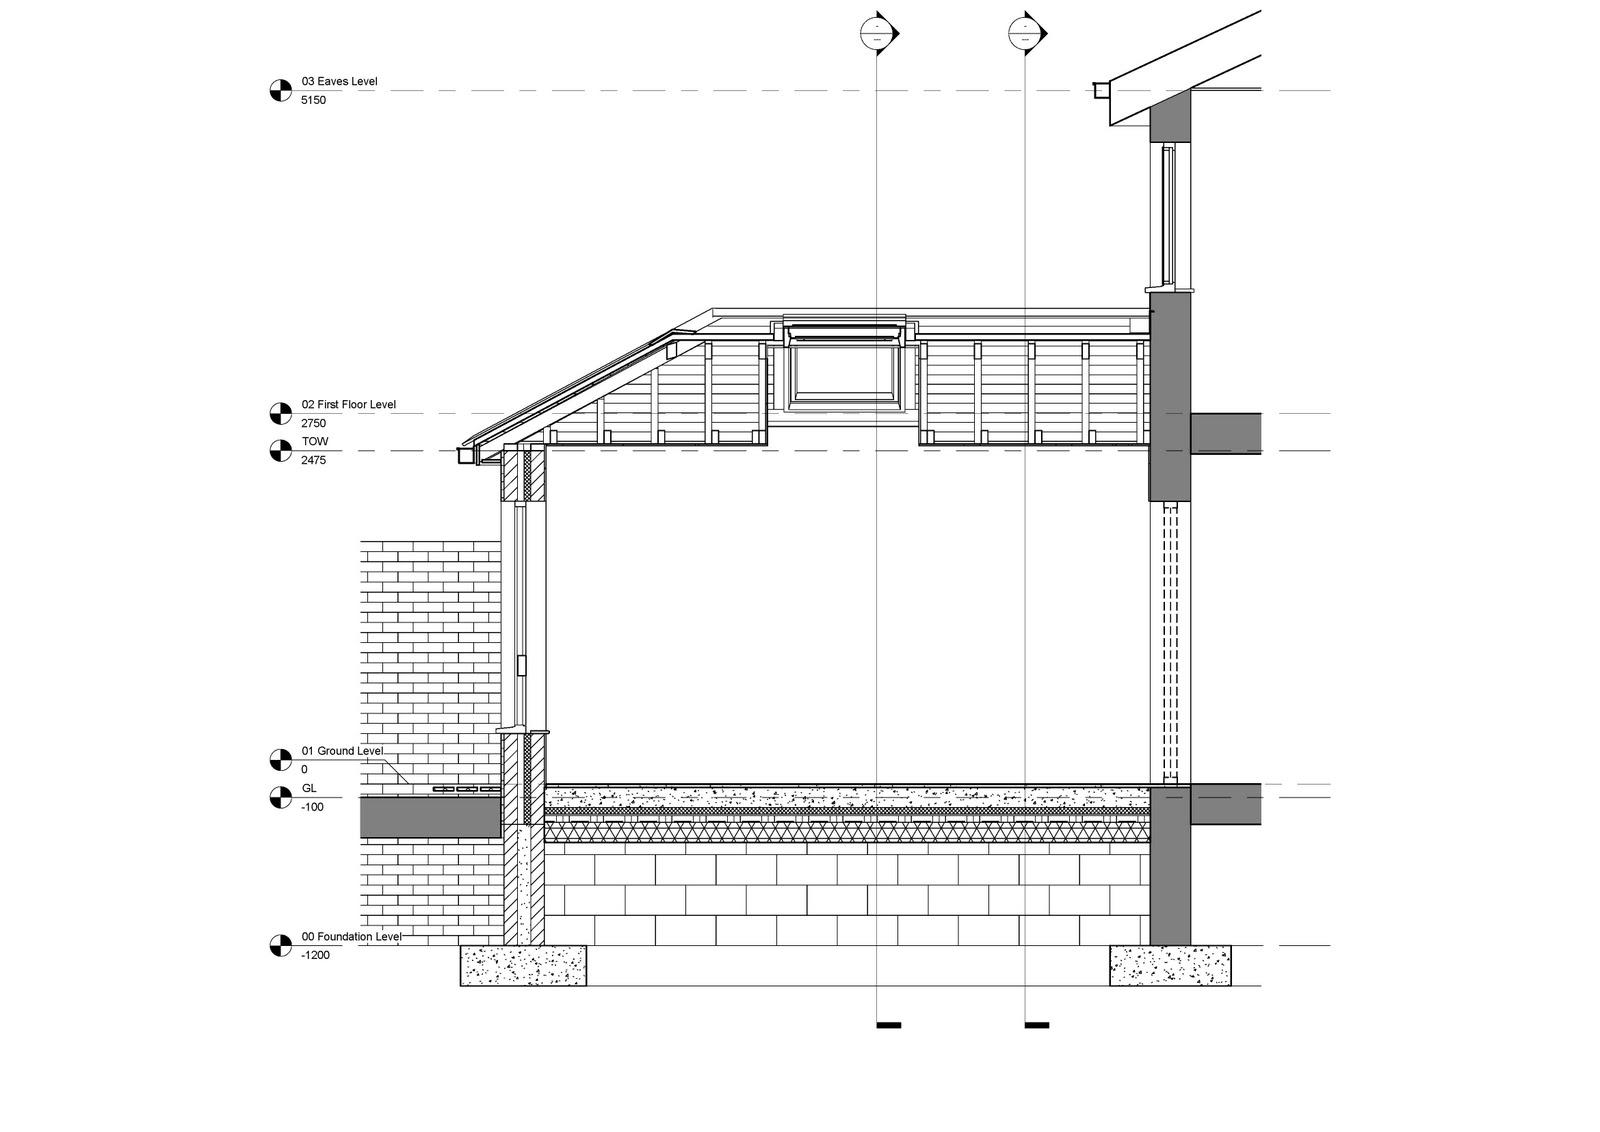 Revit Detail 09 7 House Extension Section Annotation